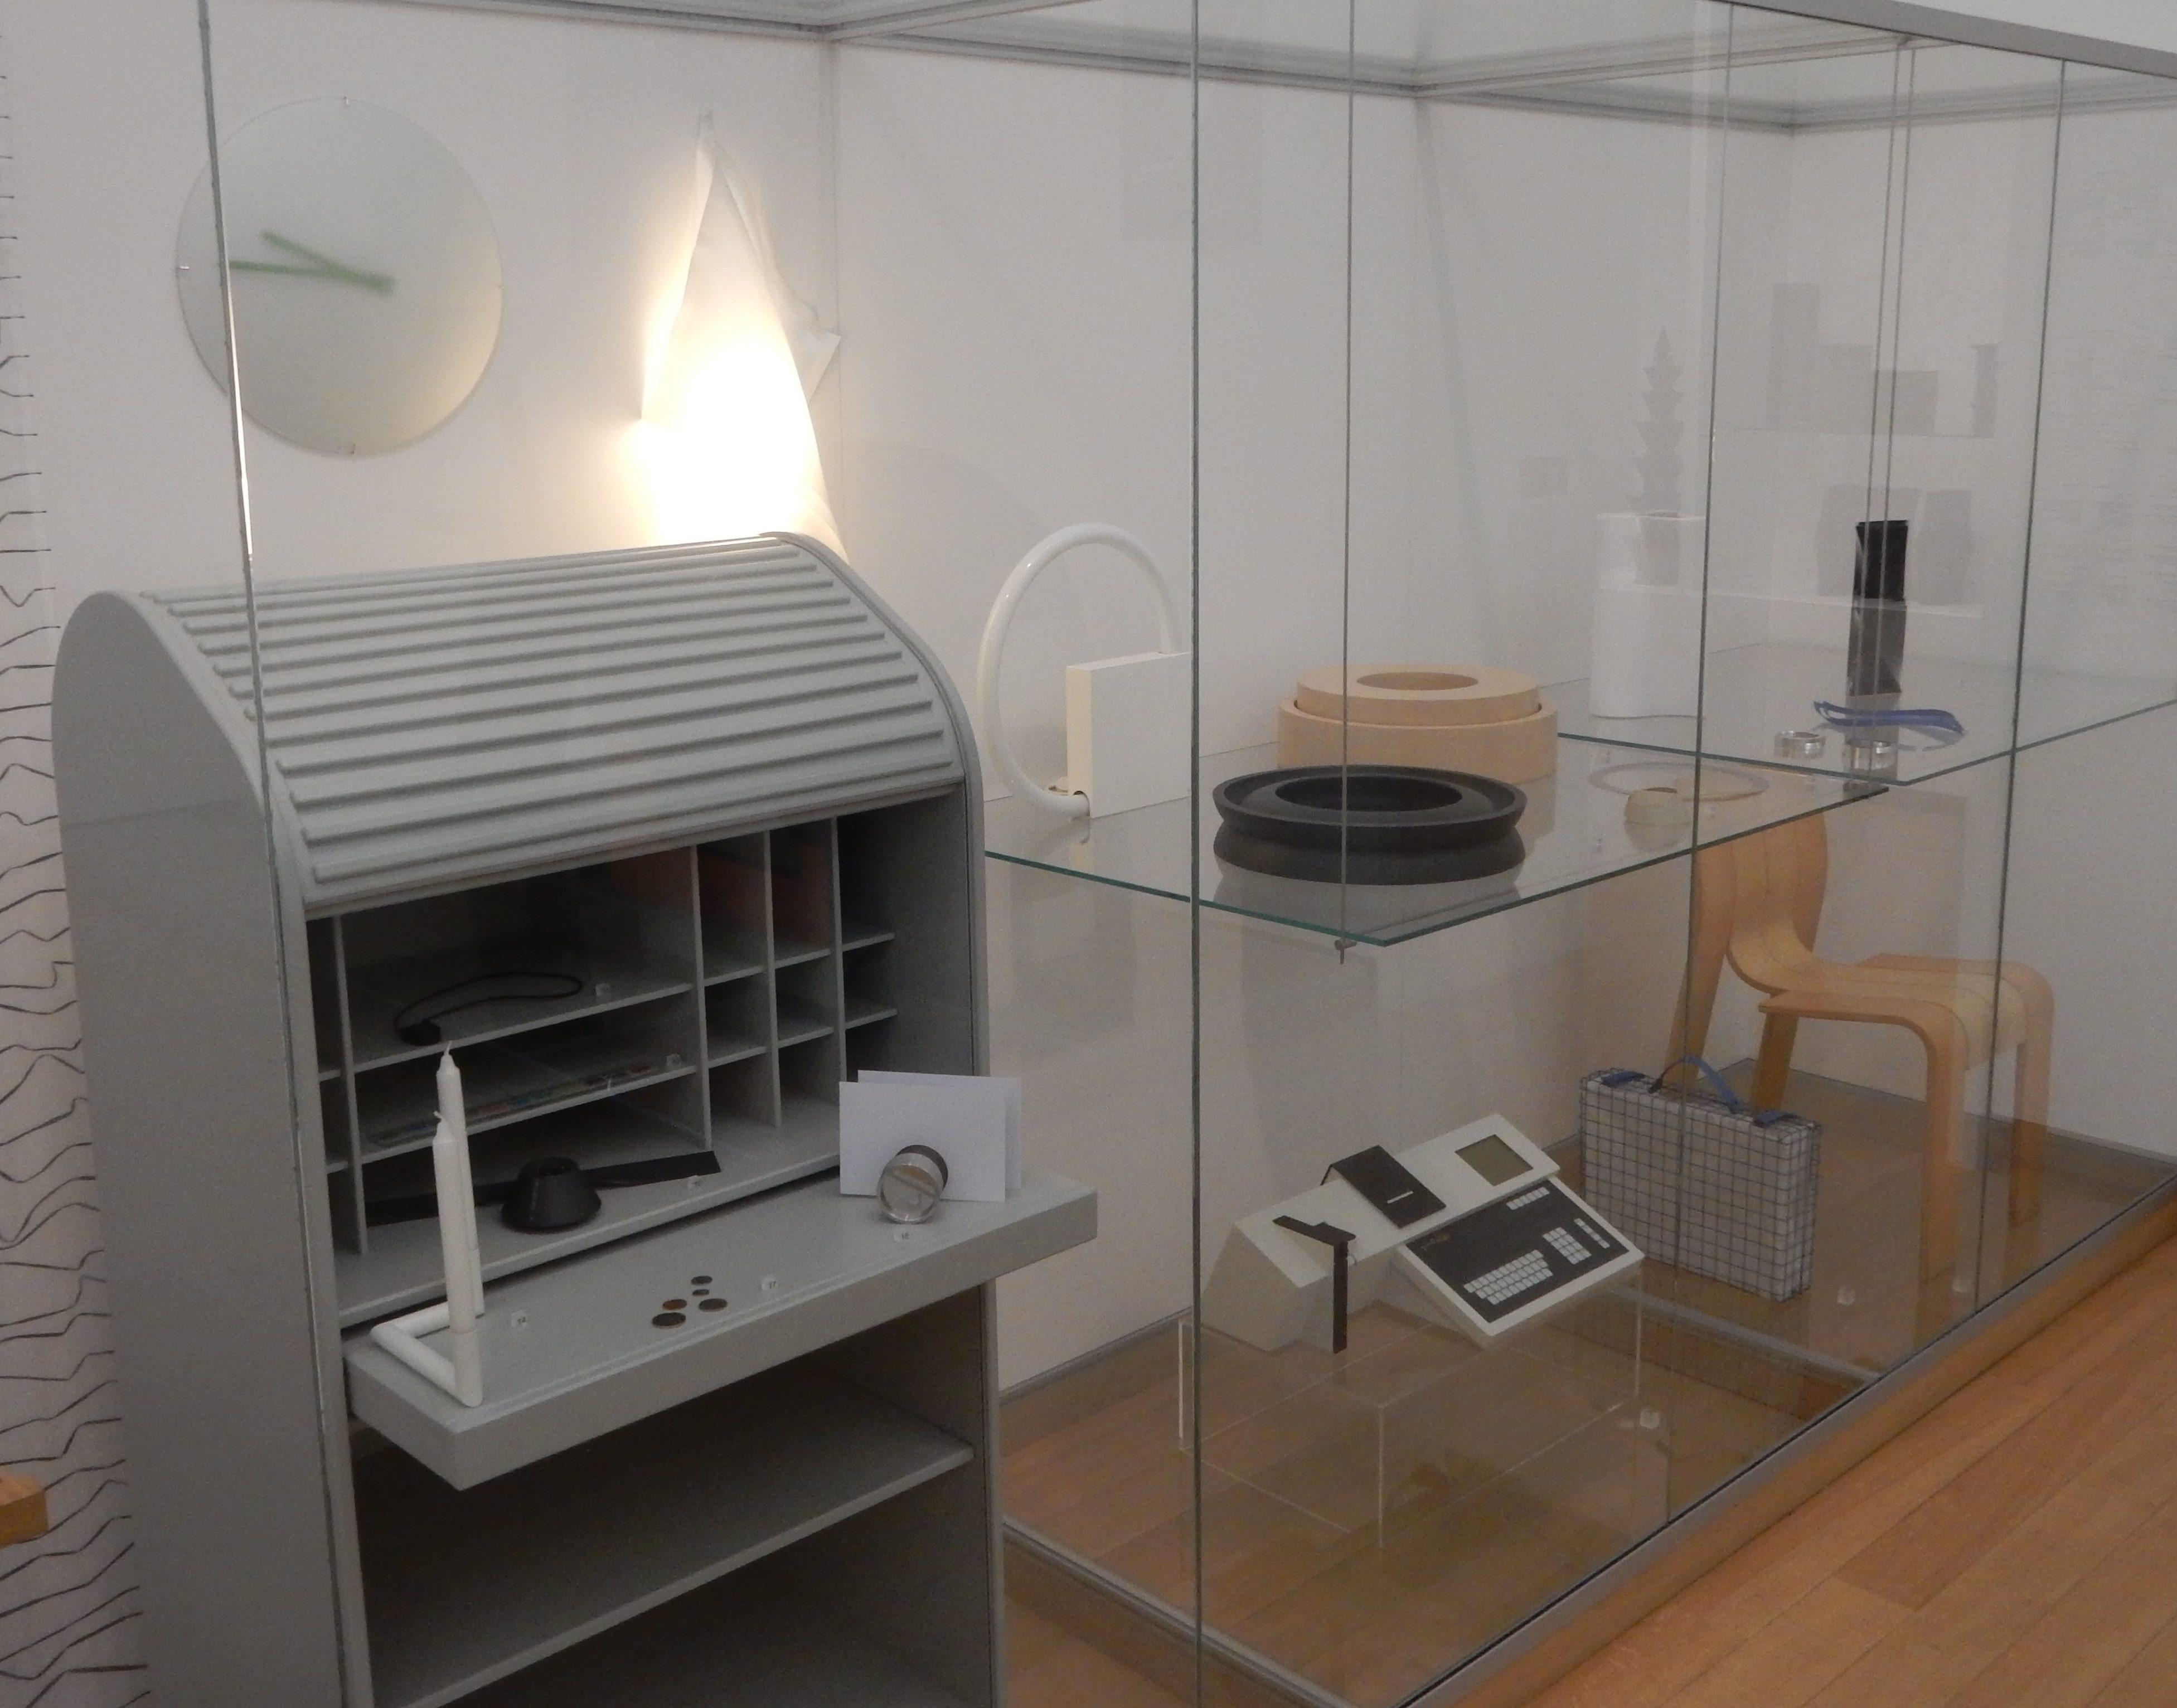 Afdeling toegepaste kunst, Stedelijk Museum Amsterdam, 2016